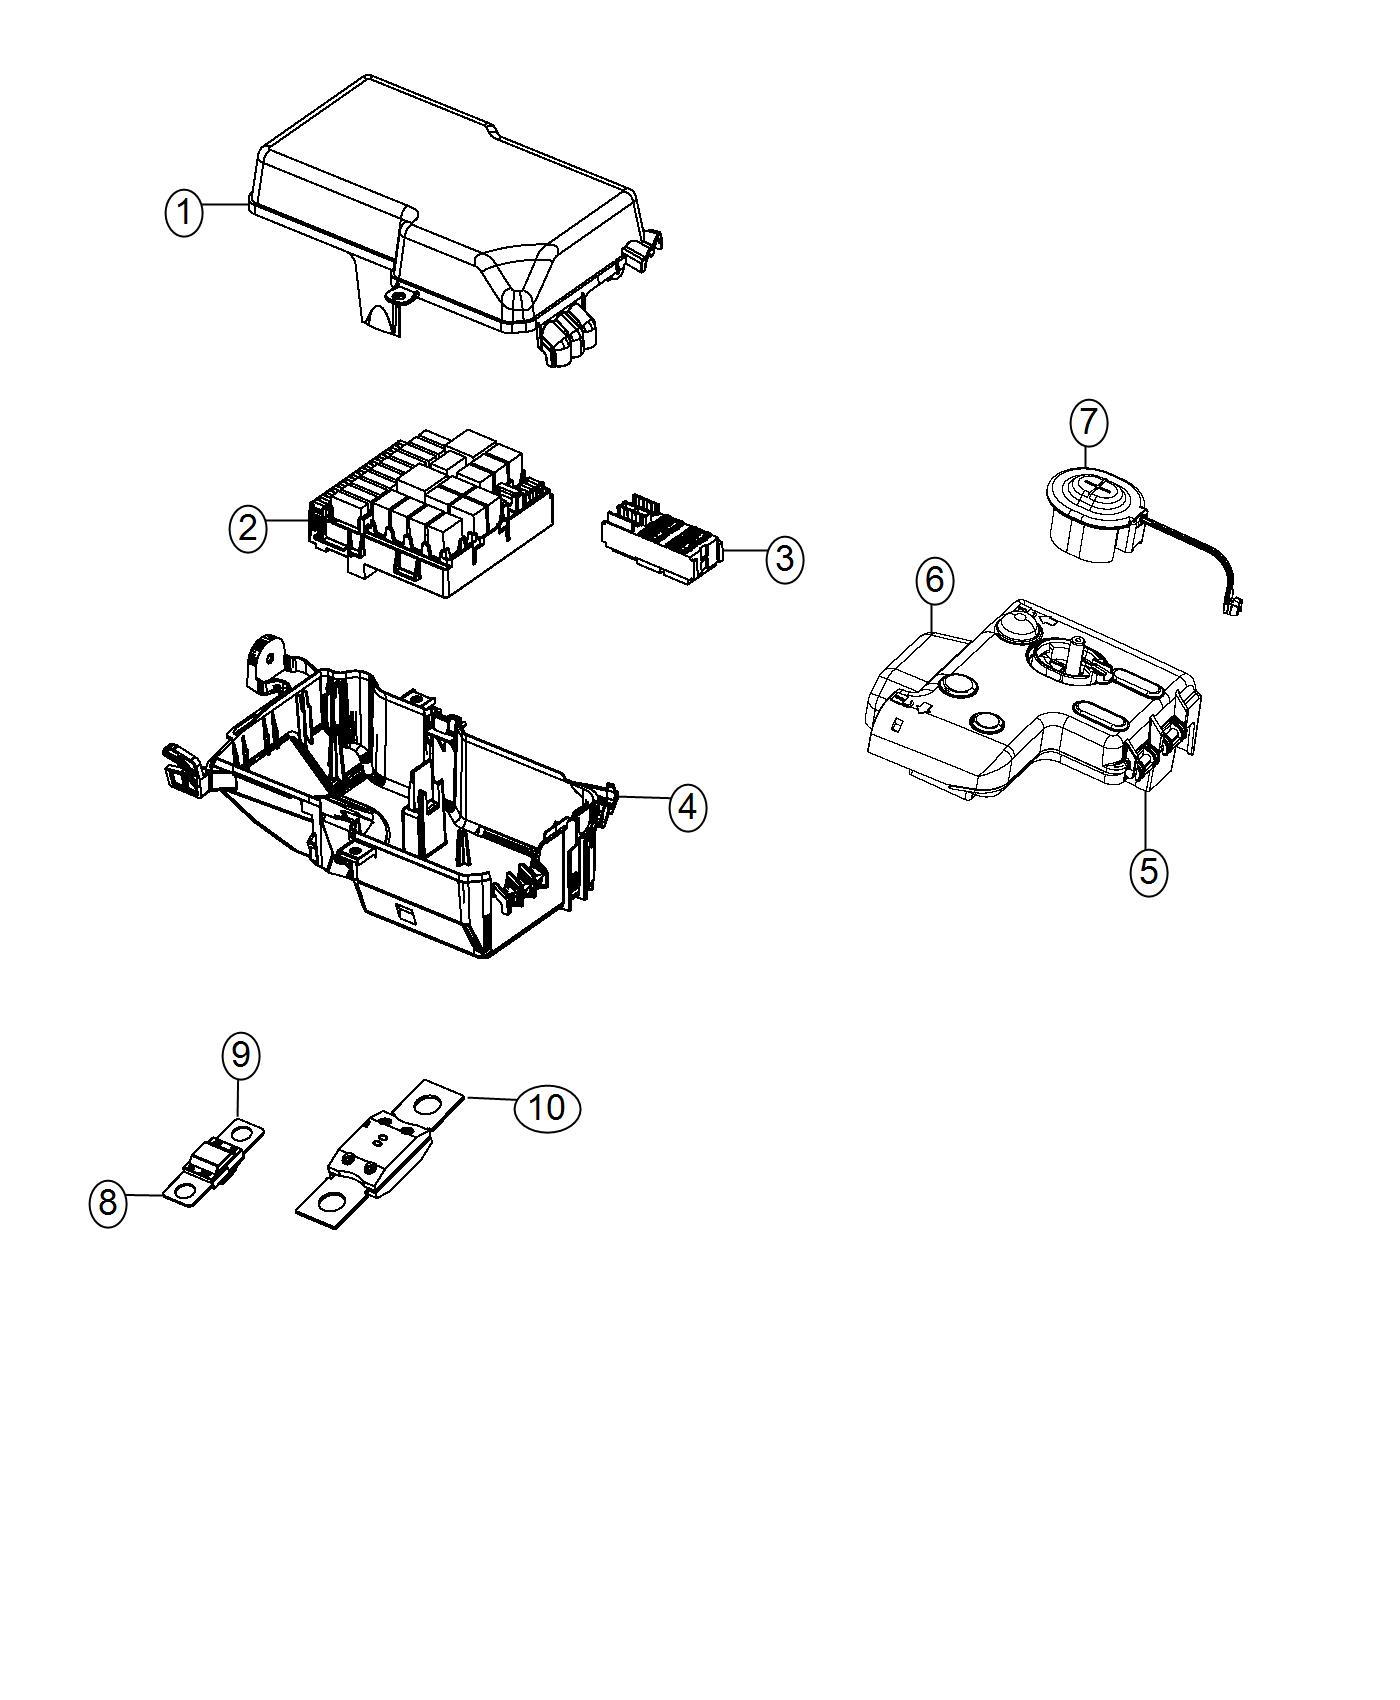 Dodge Dart Fuse Mega 200 Amp Shuttersfog Shutterssingle Hornfog Shuttersremote